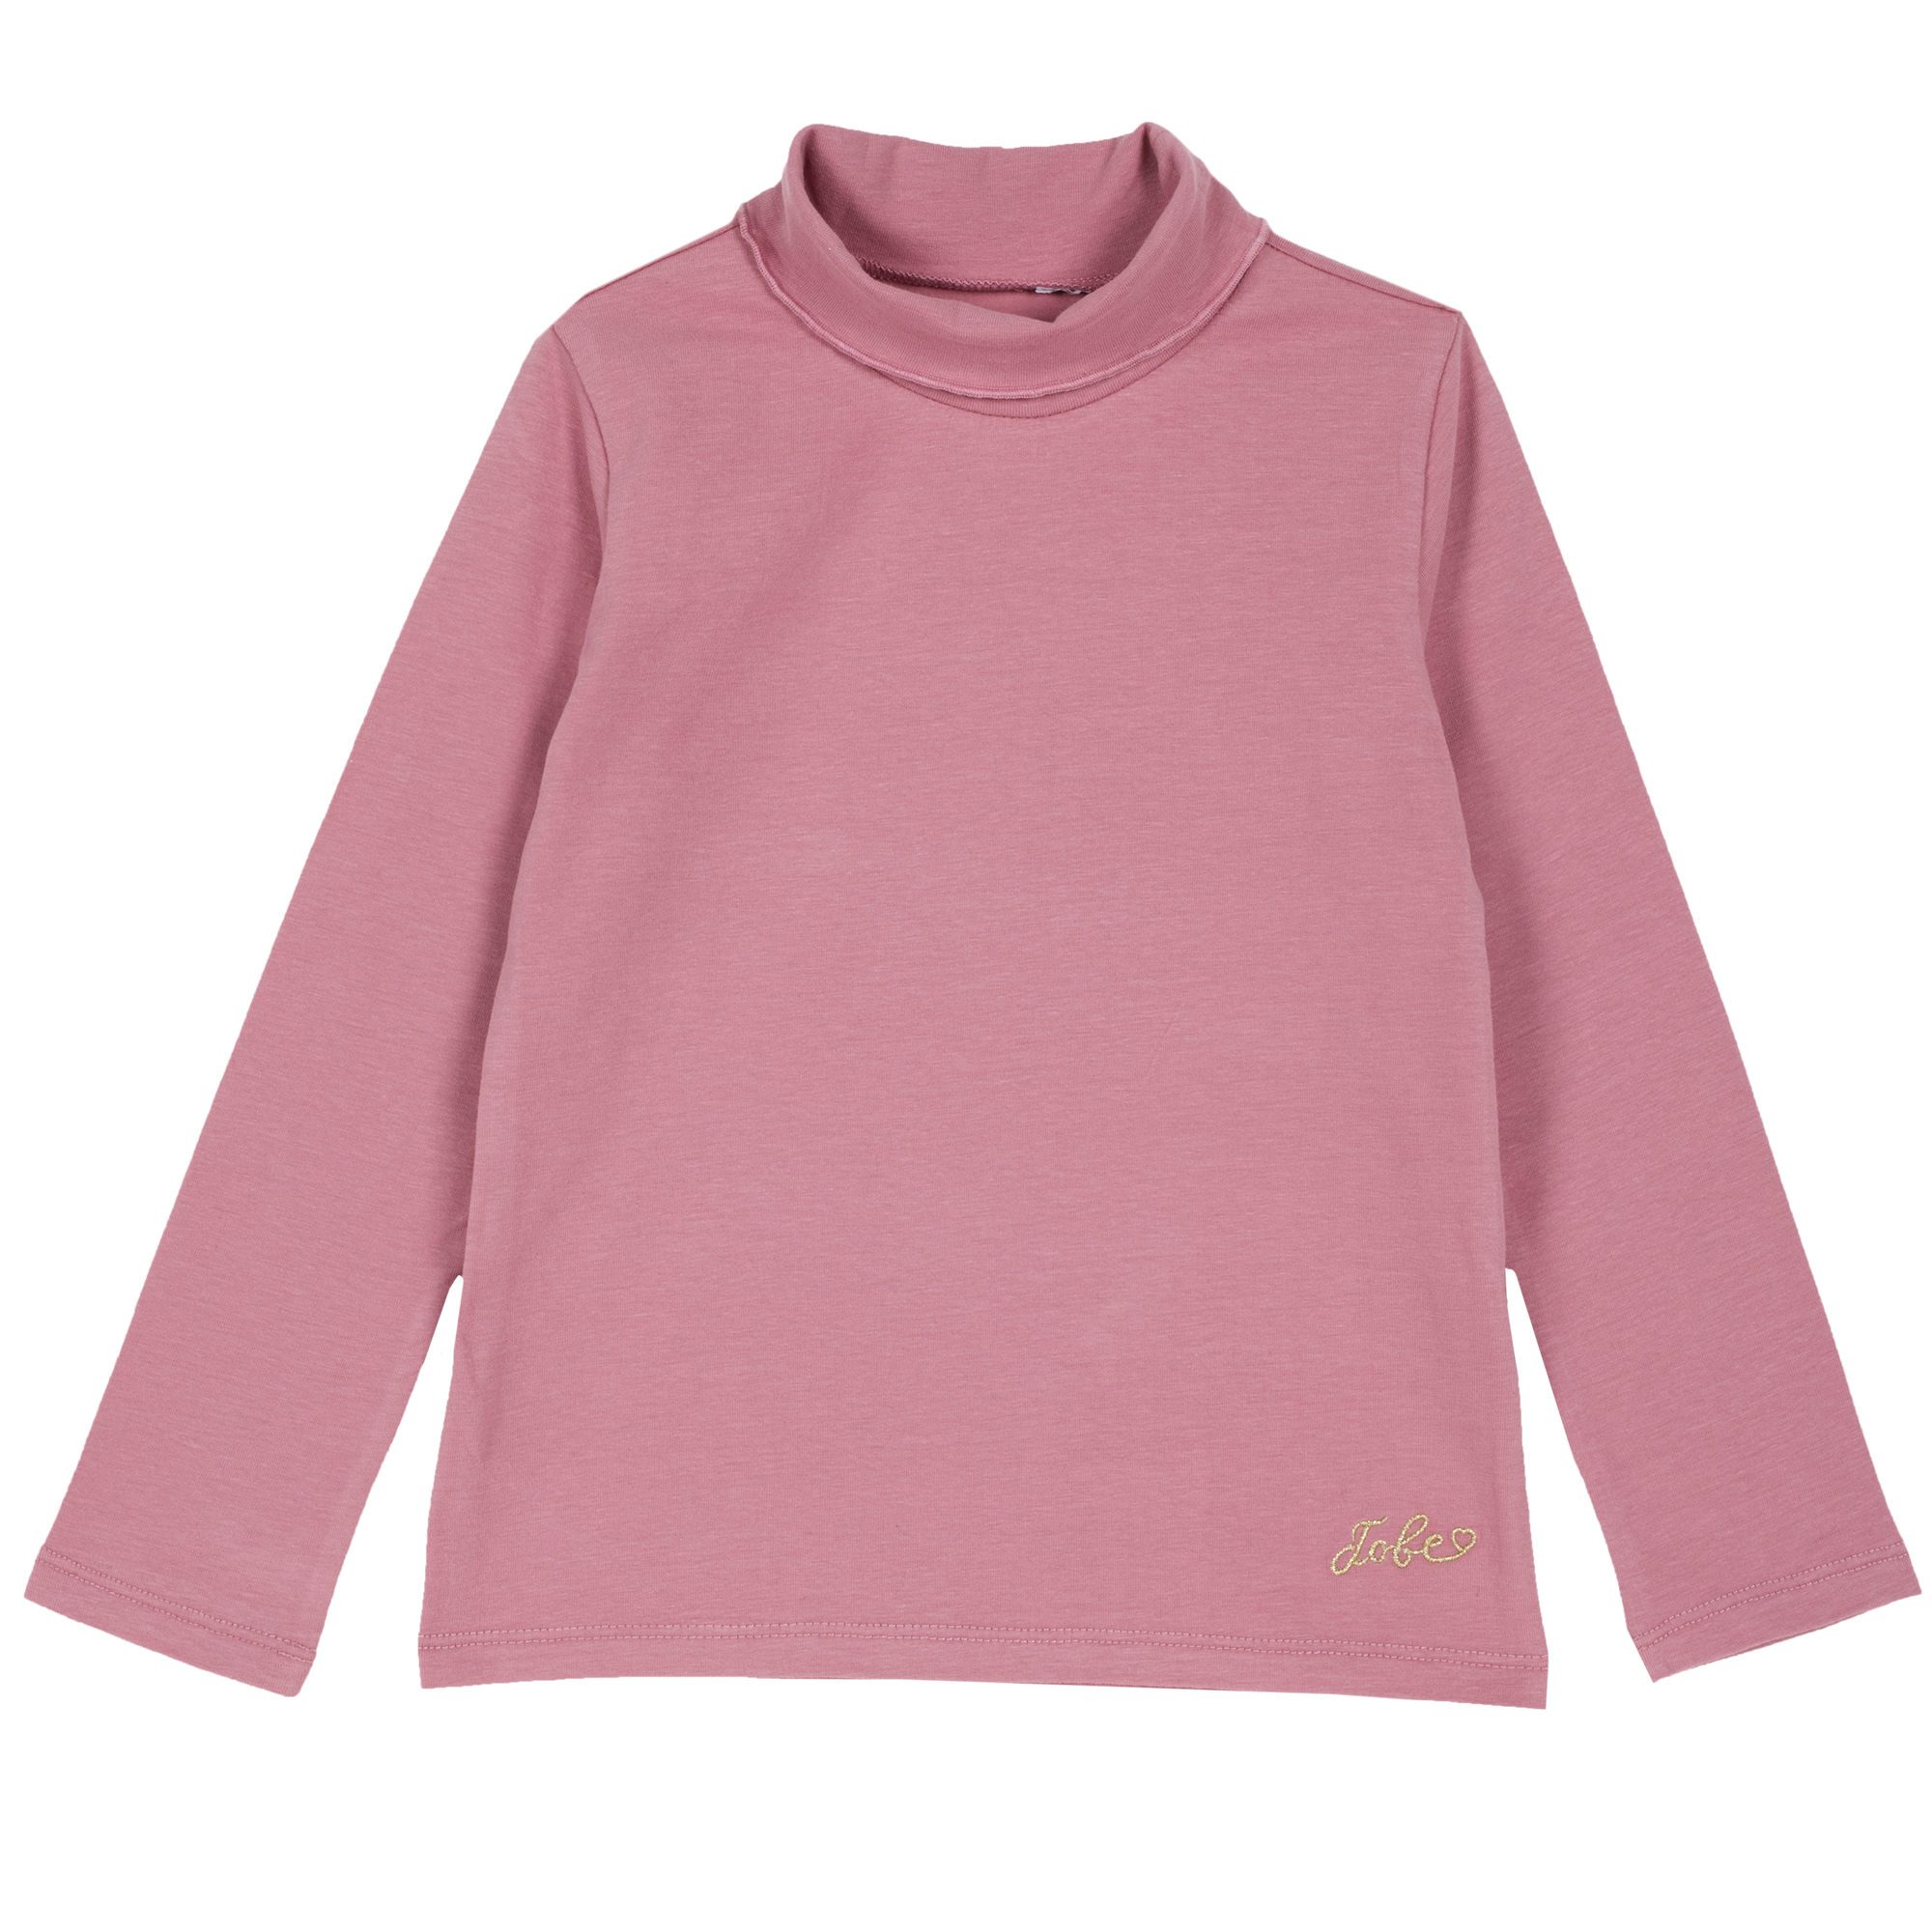 Tricou copii Chicco, corai, 06534